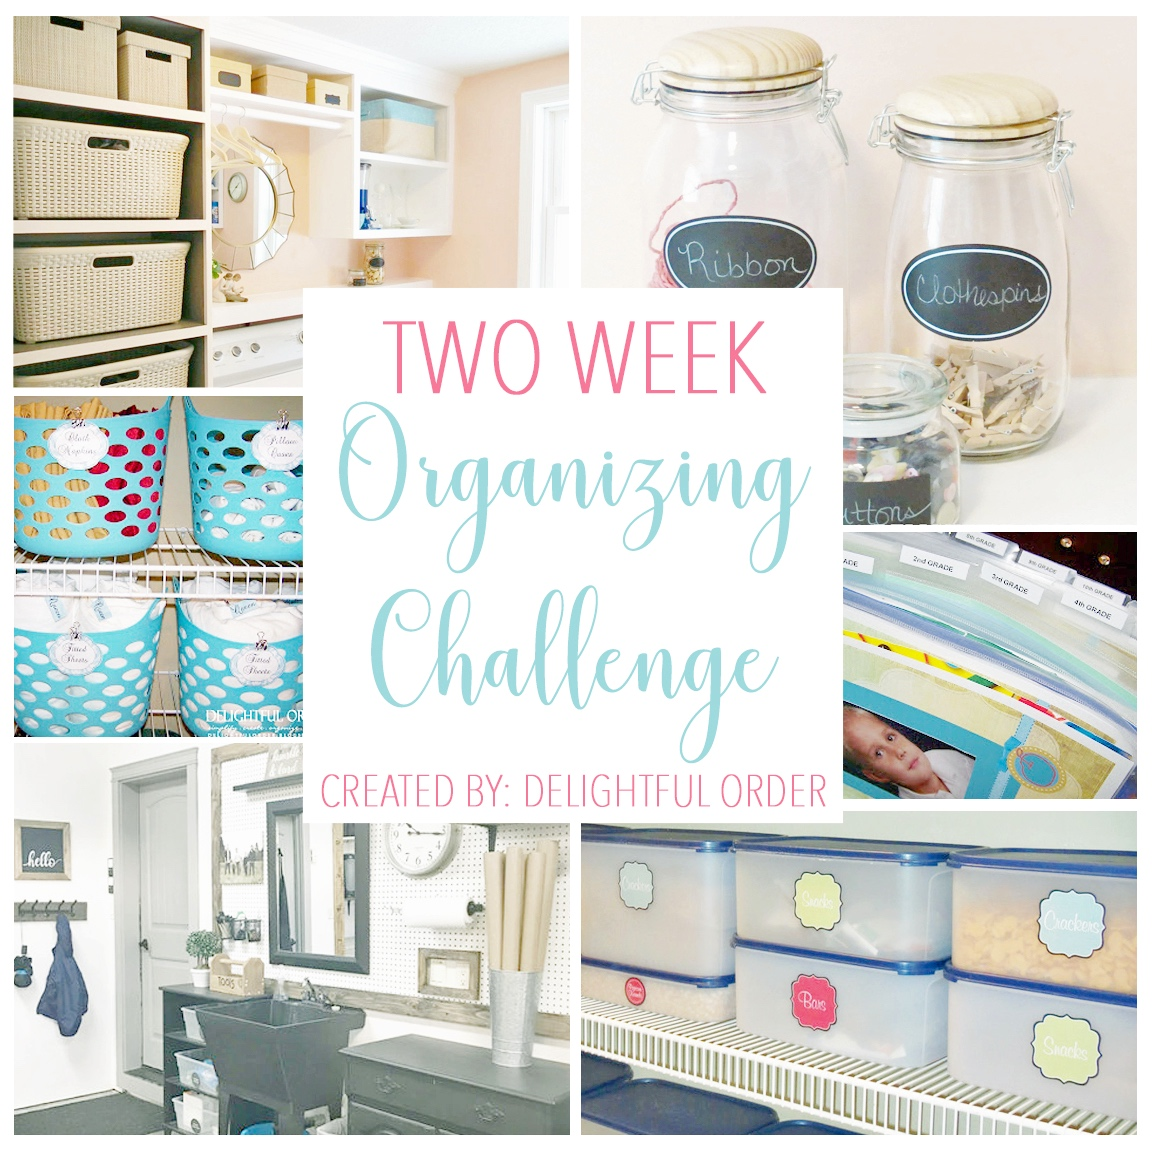 2 week organizing challenge